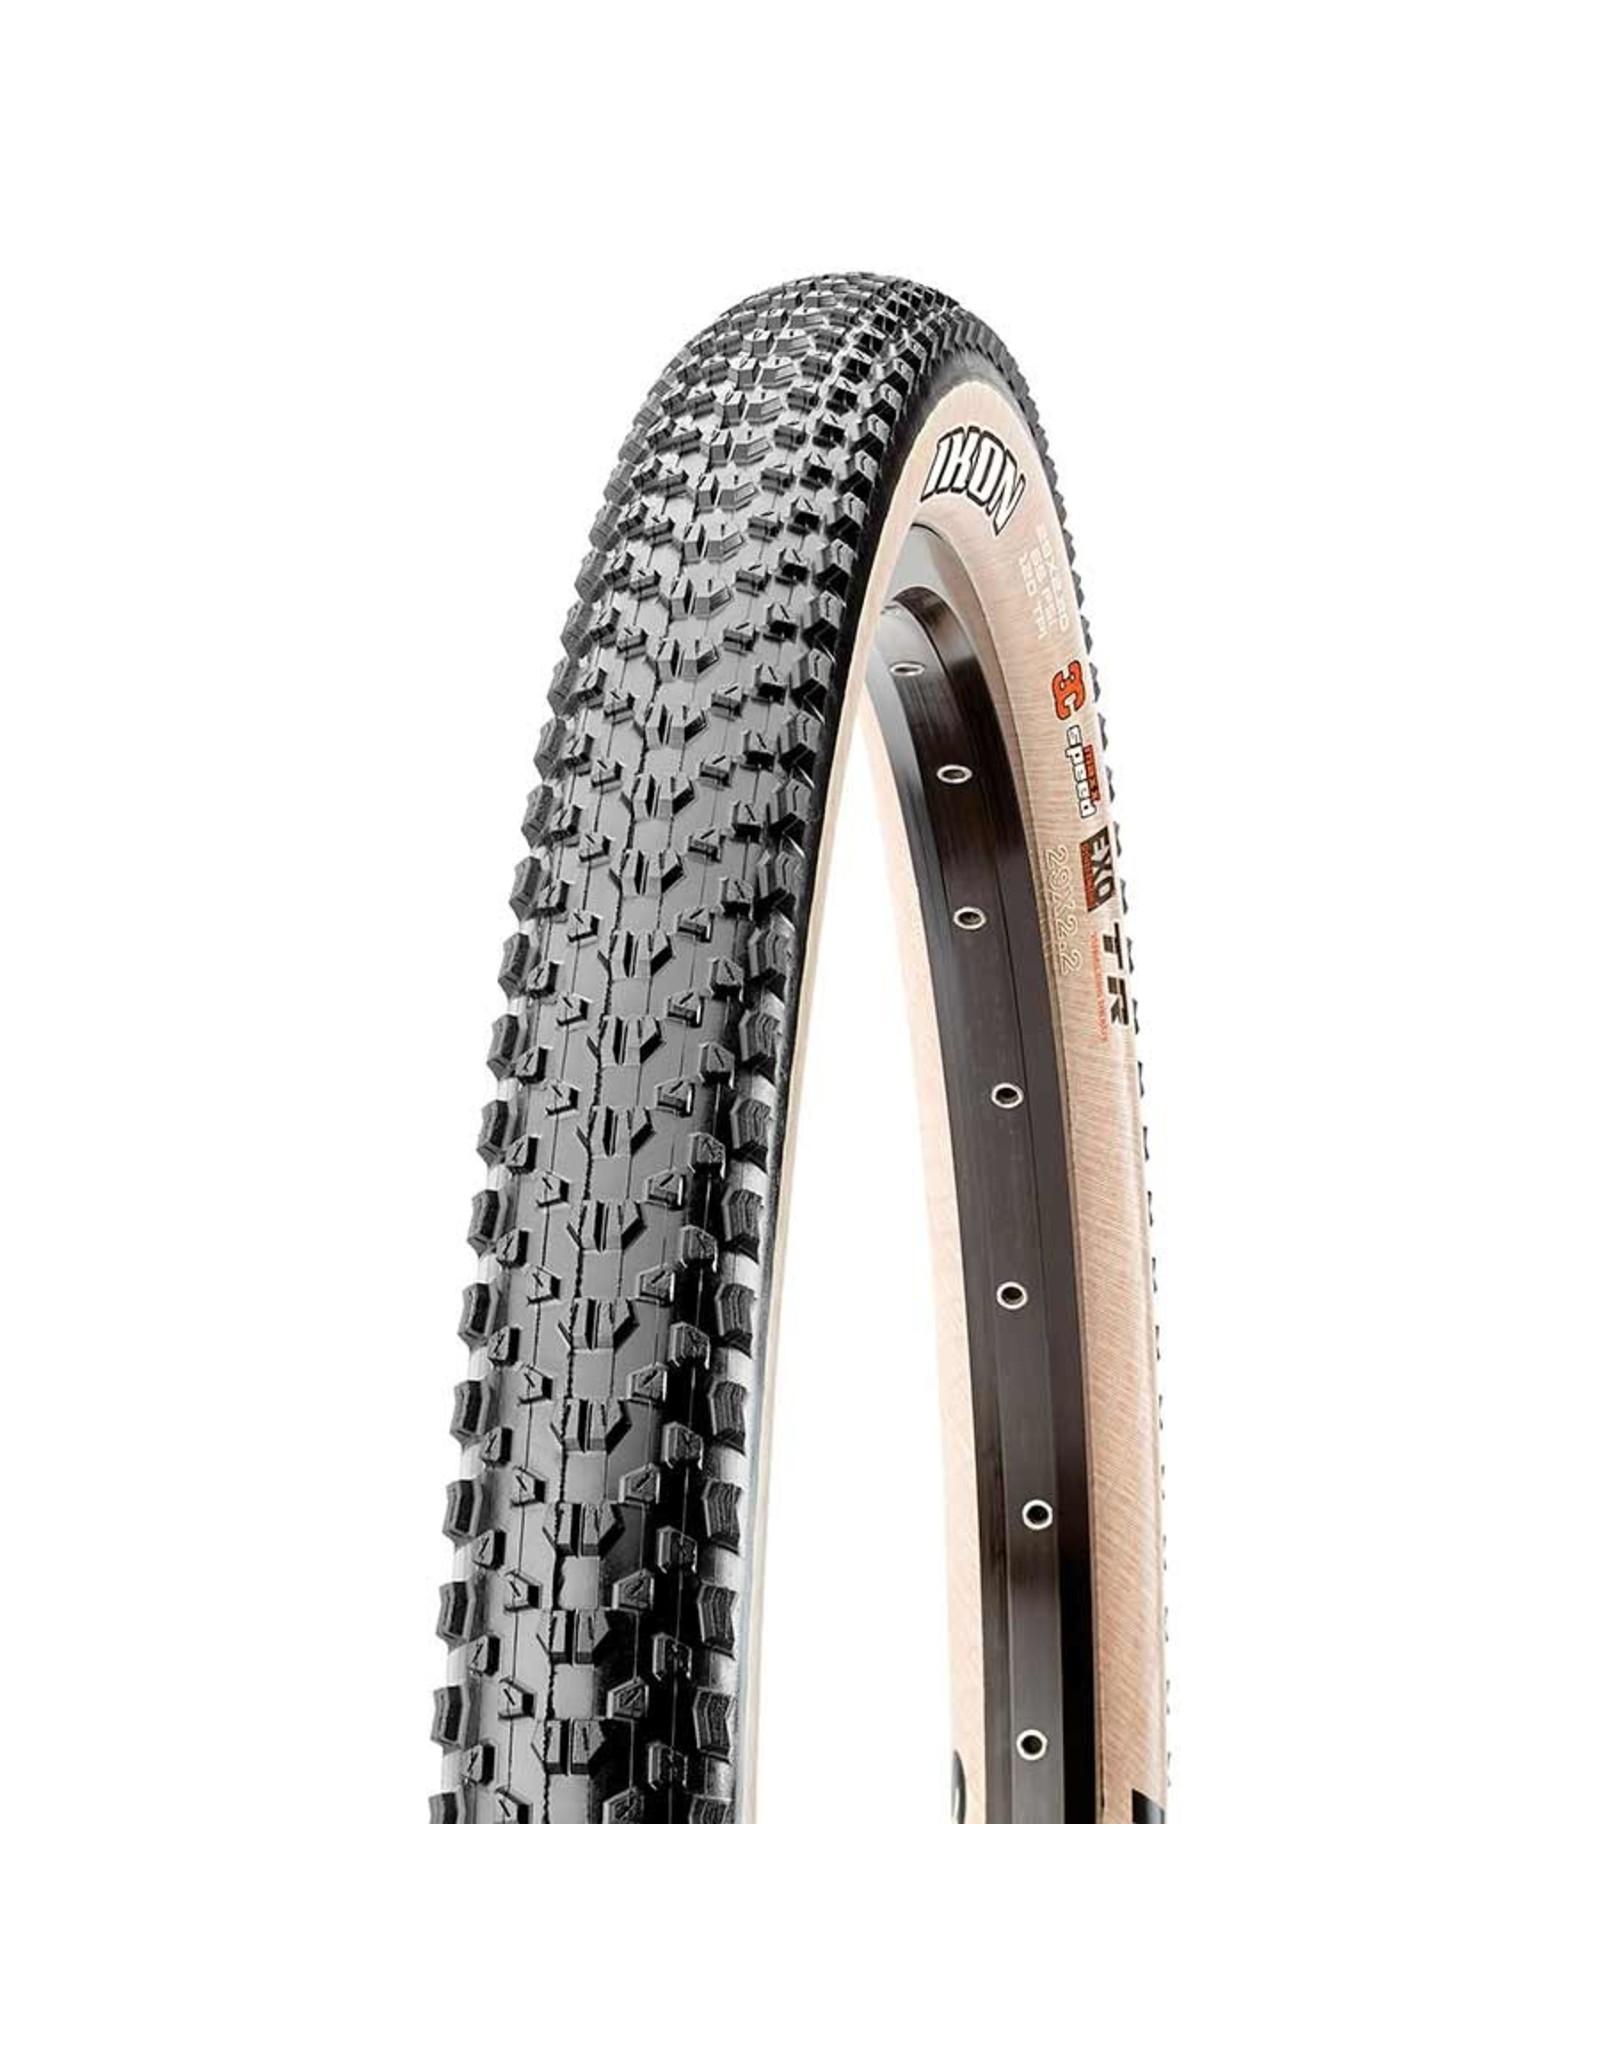 Maxxis Maxxis, Ikon, Tire, 29''x2.20, Folding, Tubeless Ready, 3C Maxx Speed, EXO, 60TPI, Beige